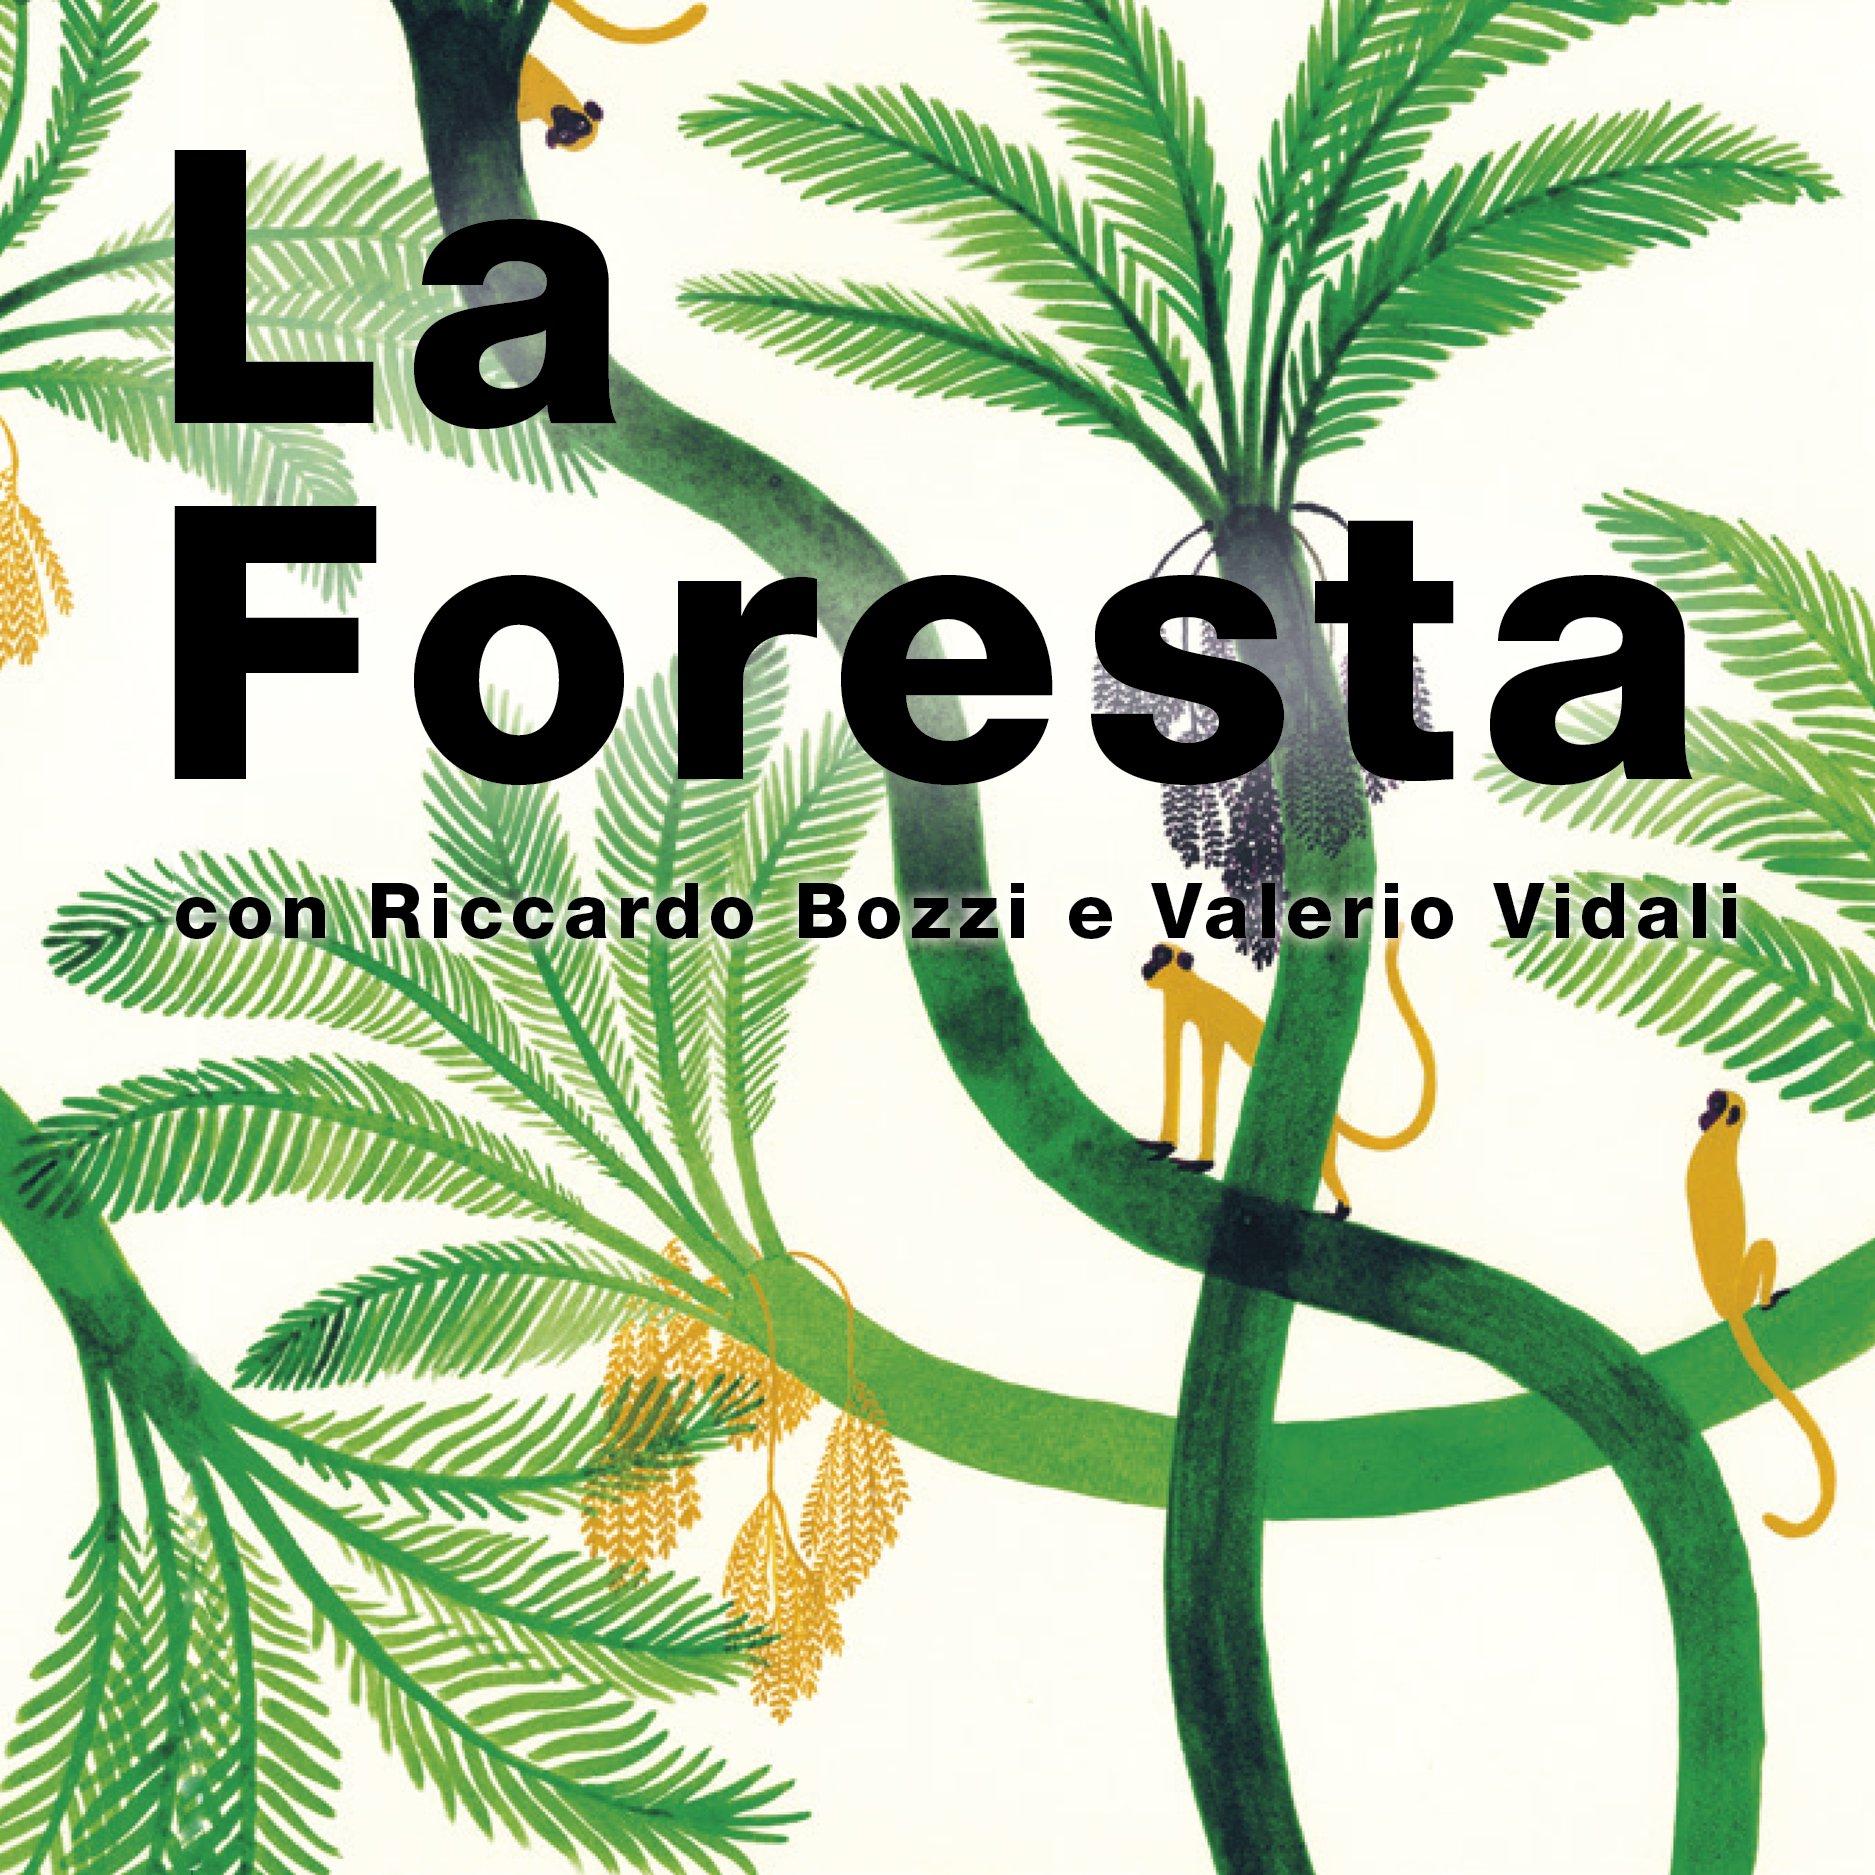 La Foresta / Riccardo Bozzi • Valerio Vidali • Violeta Lopiz